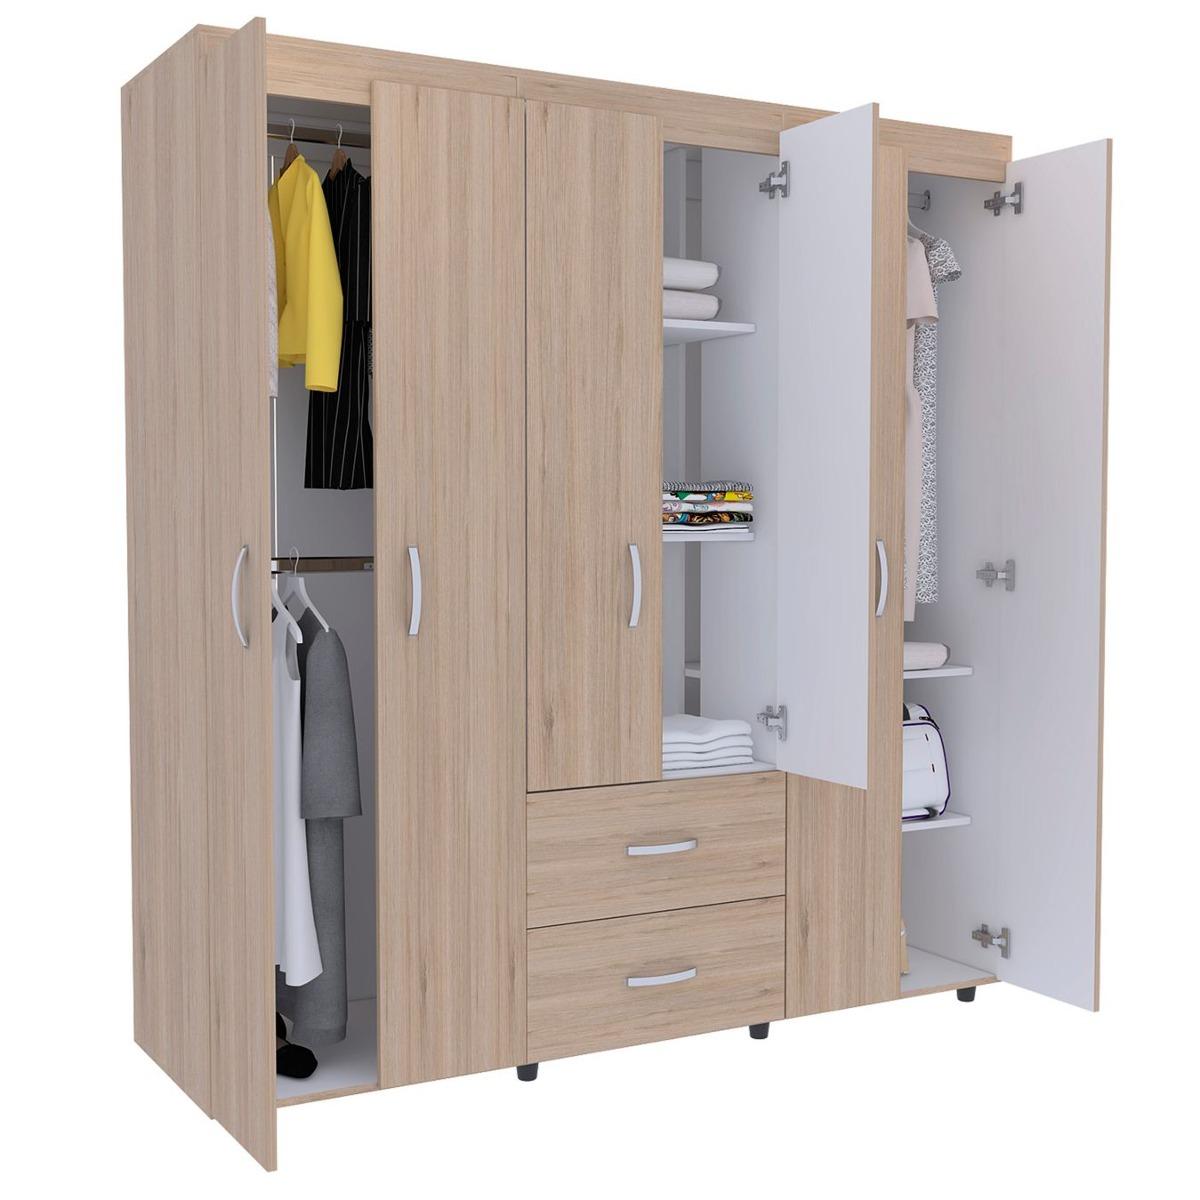 Rta Design Closet Bariloche 180x170.3x50.3cm Muebles Rt Acu2 ...